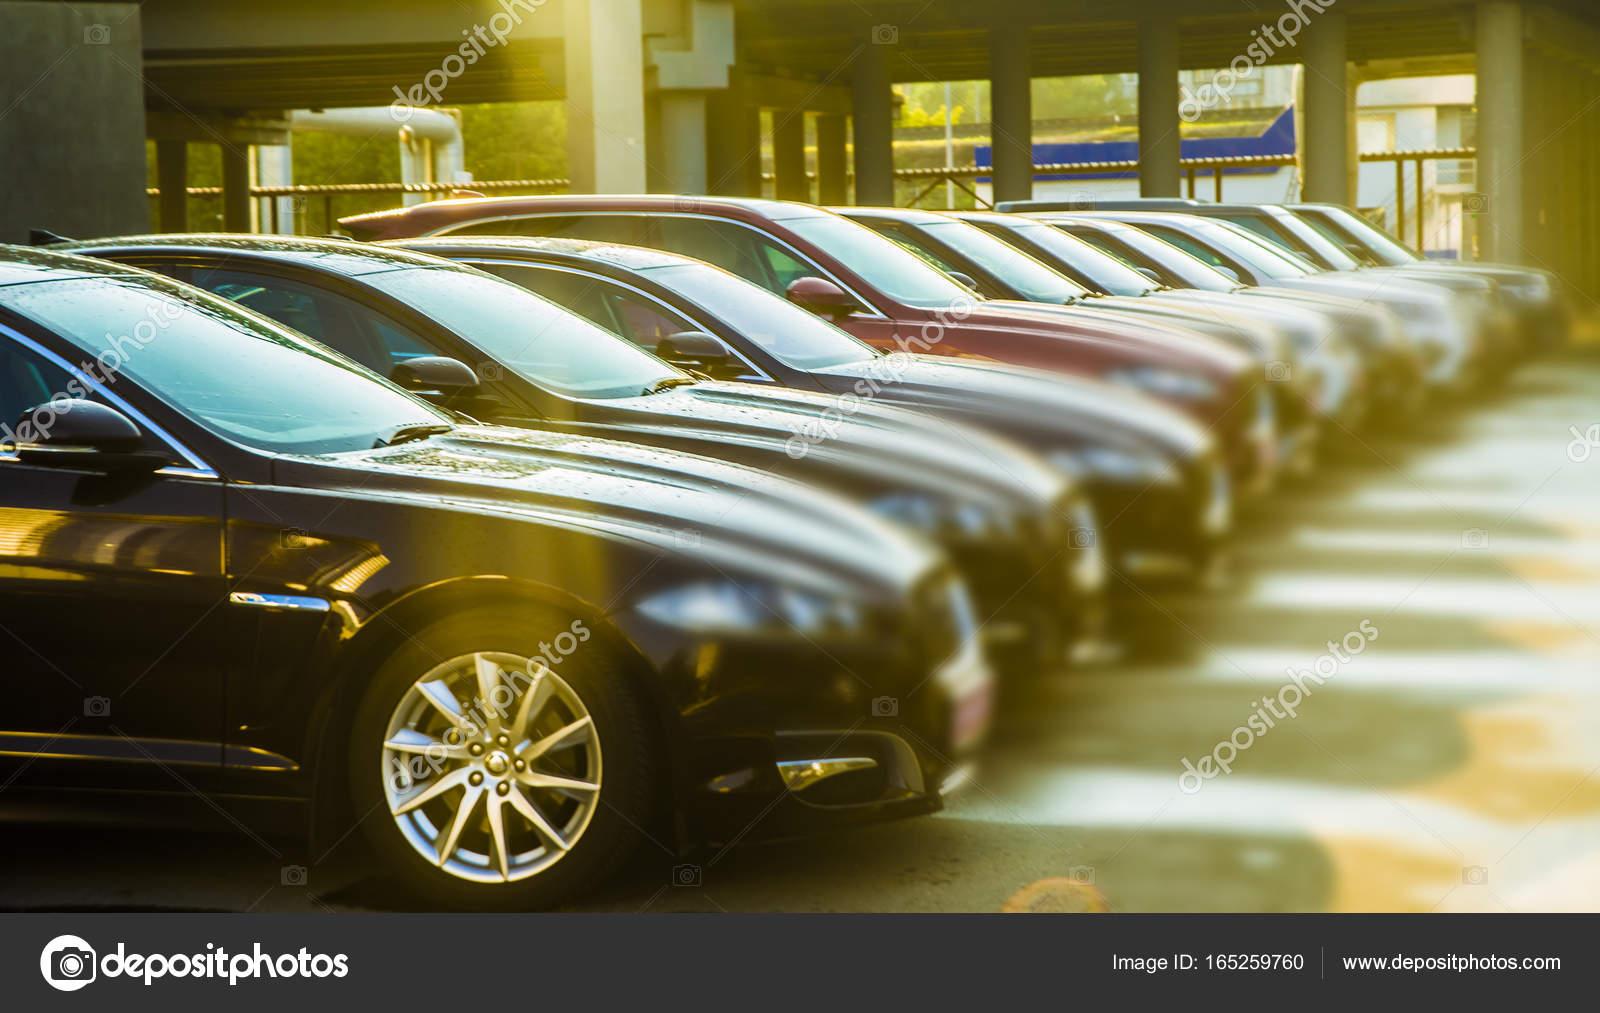 Luxury Cars For Sale Stock Editorial Photo C Borjomi88 165259760